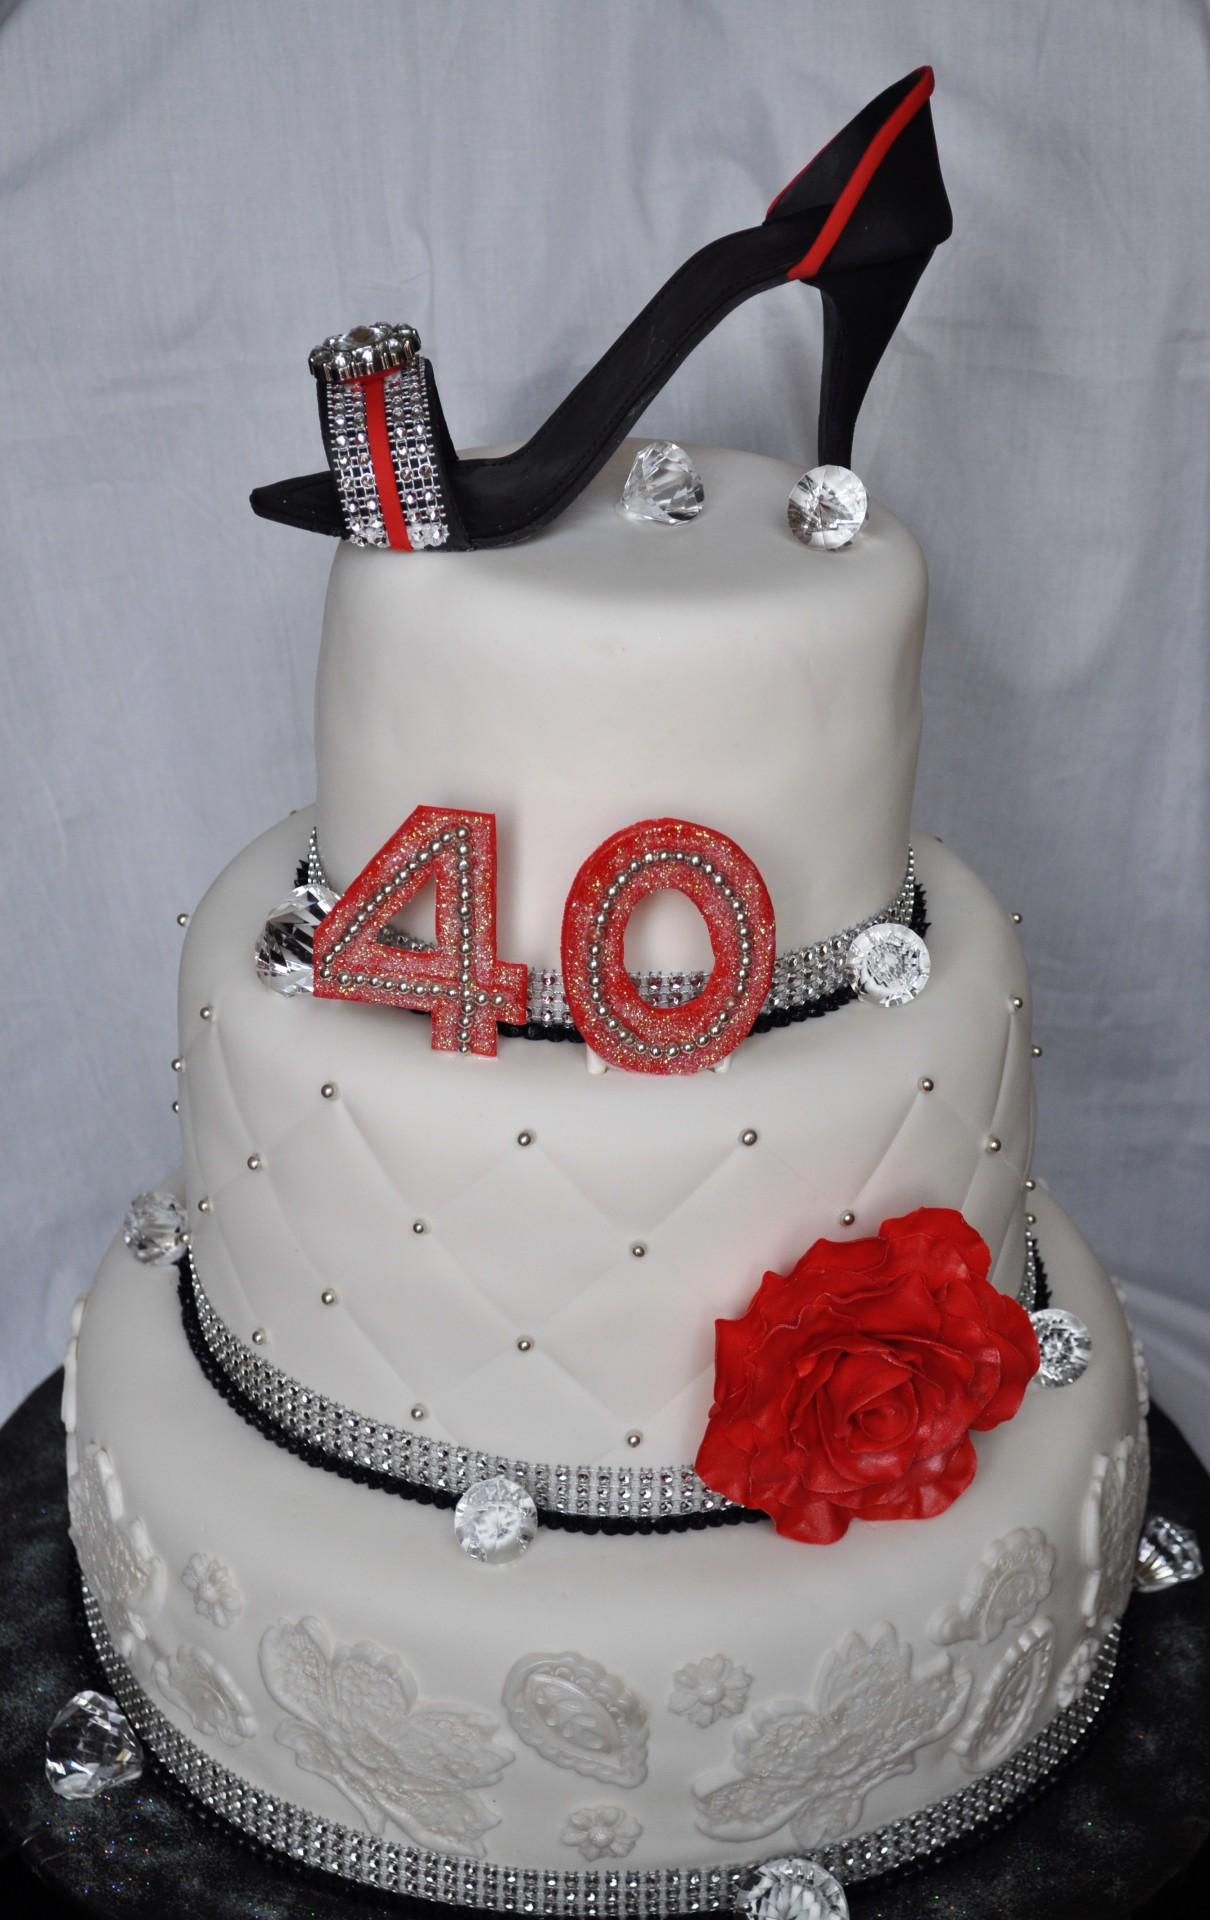 Heel, glam cake ,40th birthday cake for her